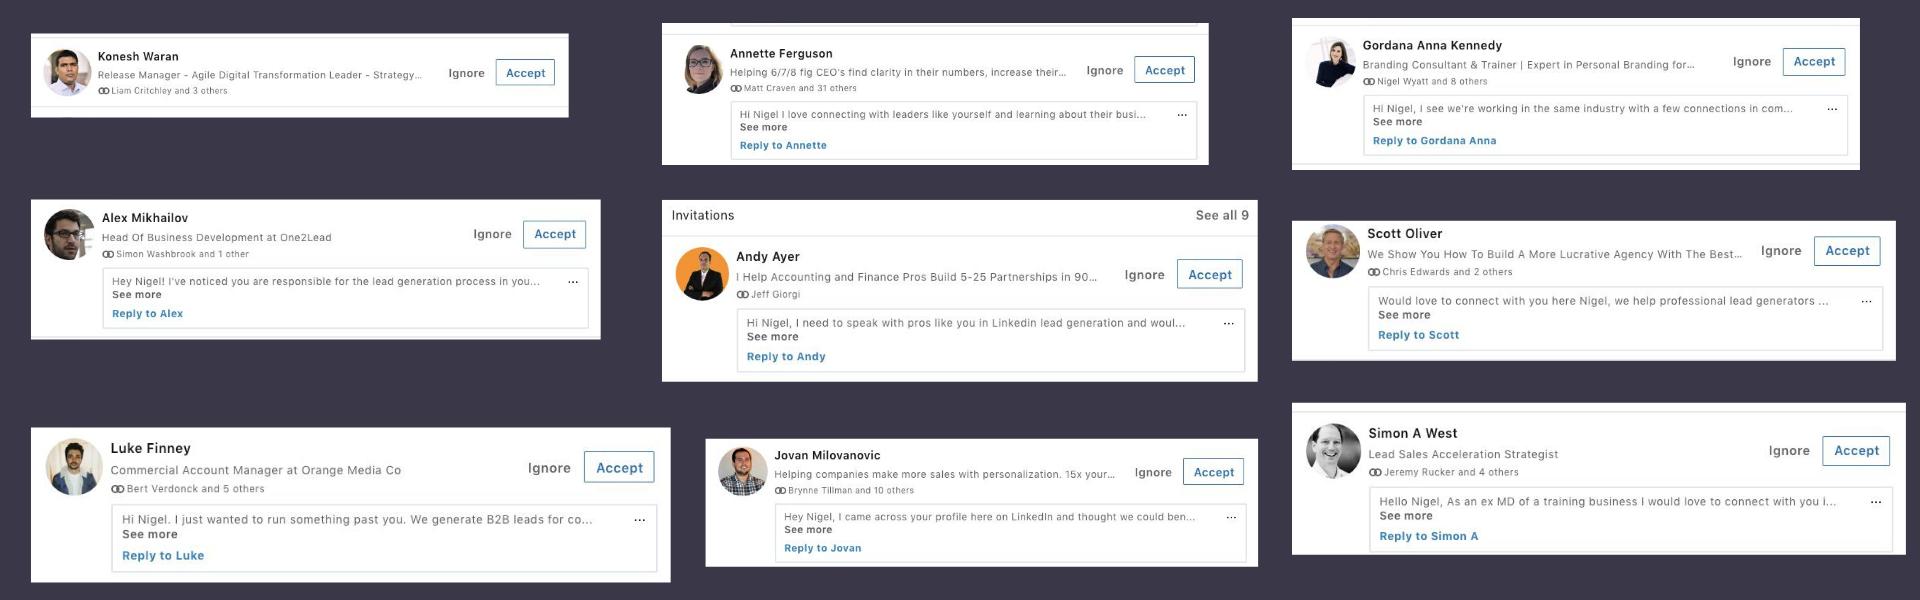 Auto LinkedIn Lead Generation